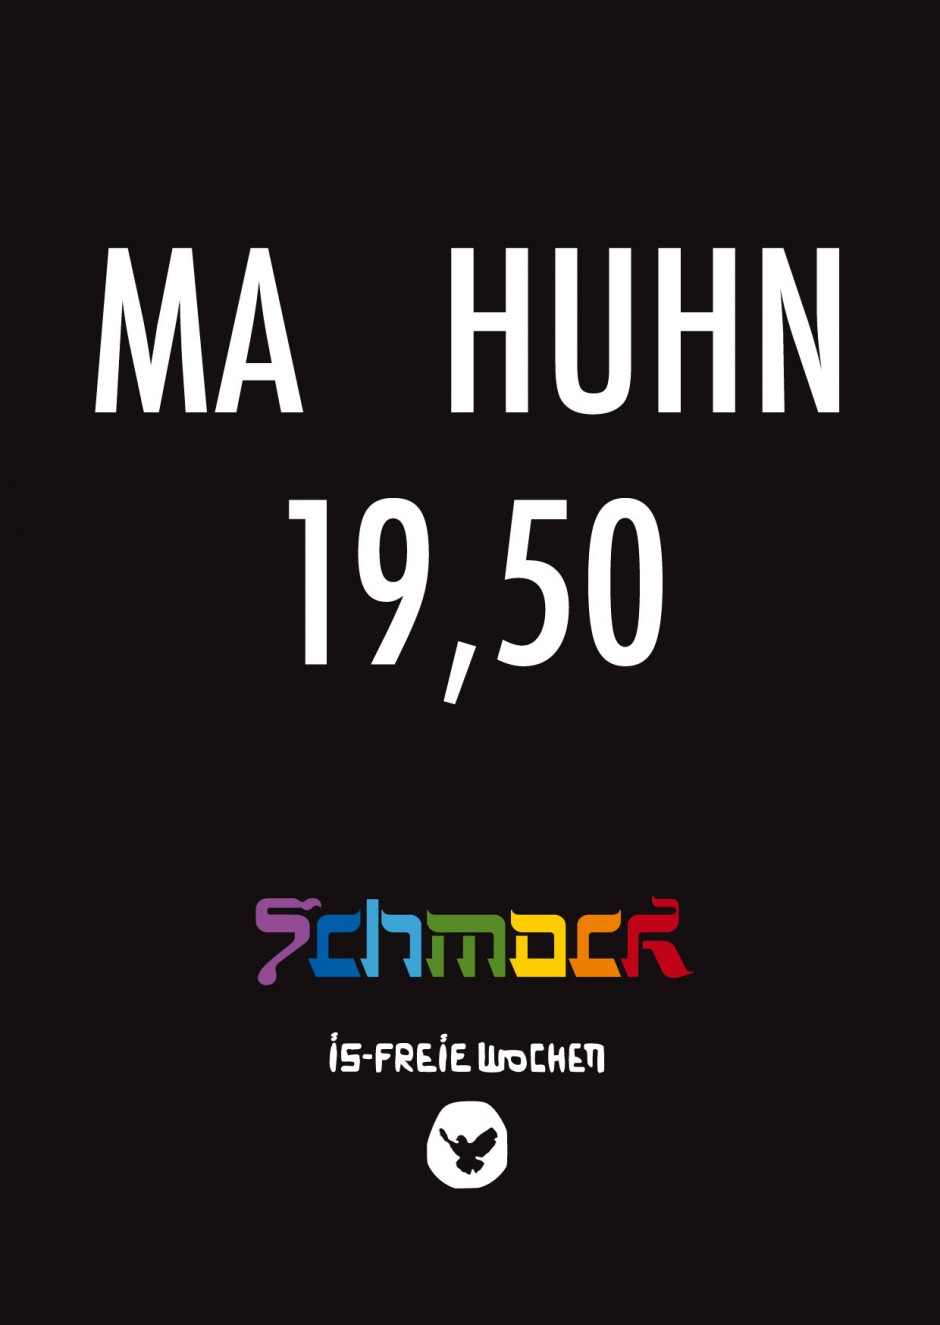 KR_141103_Schmock_05